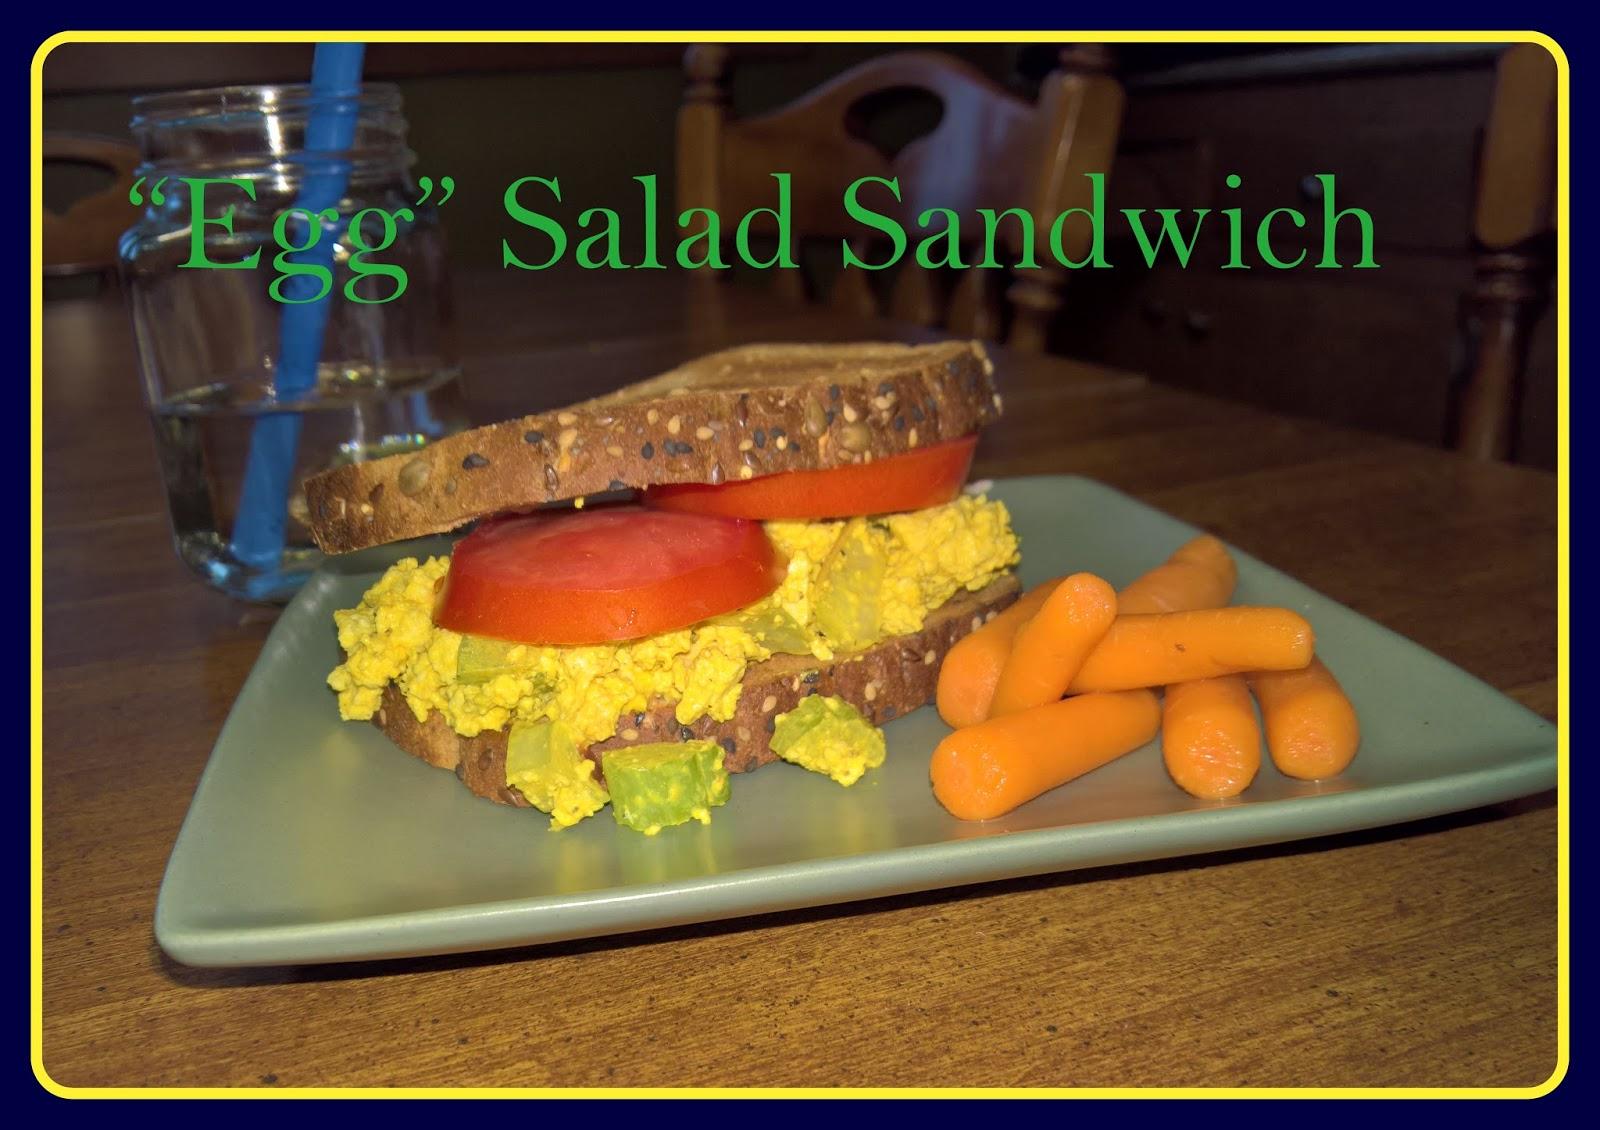 Fresh-You Nutrition, Fitness, and Wellness: Egg-Less Egg ...